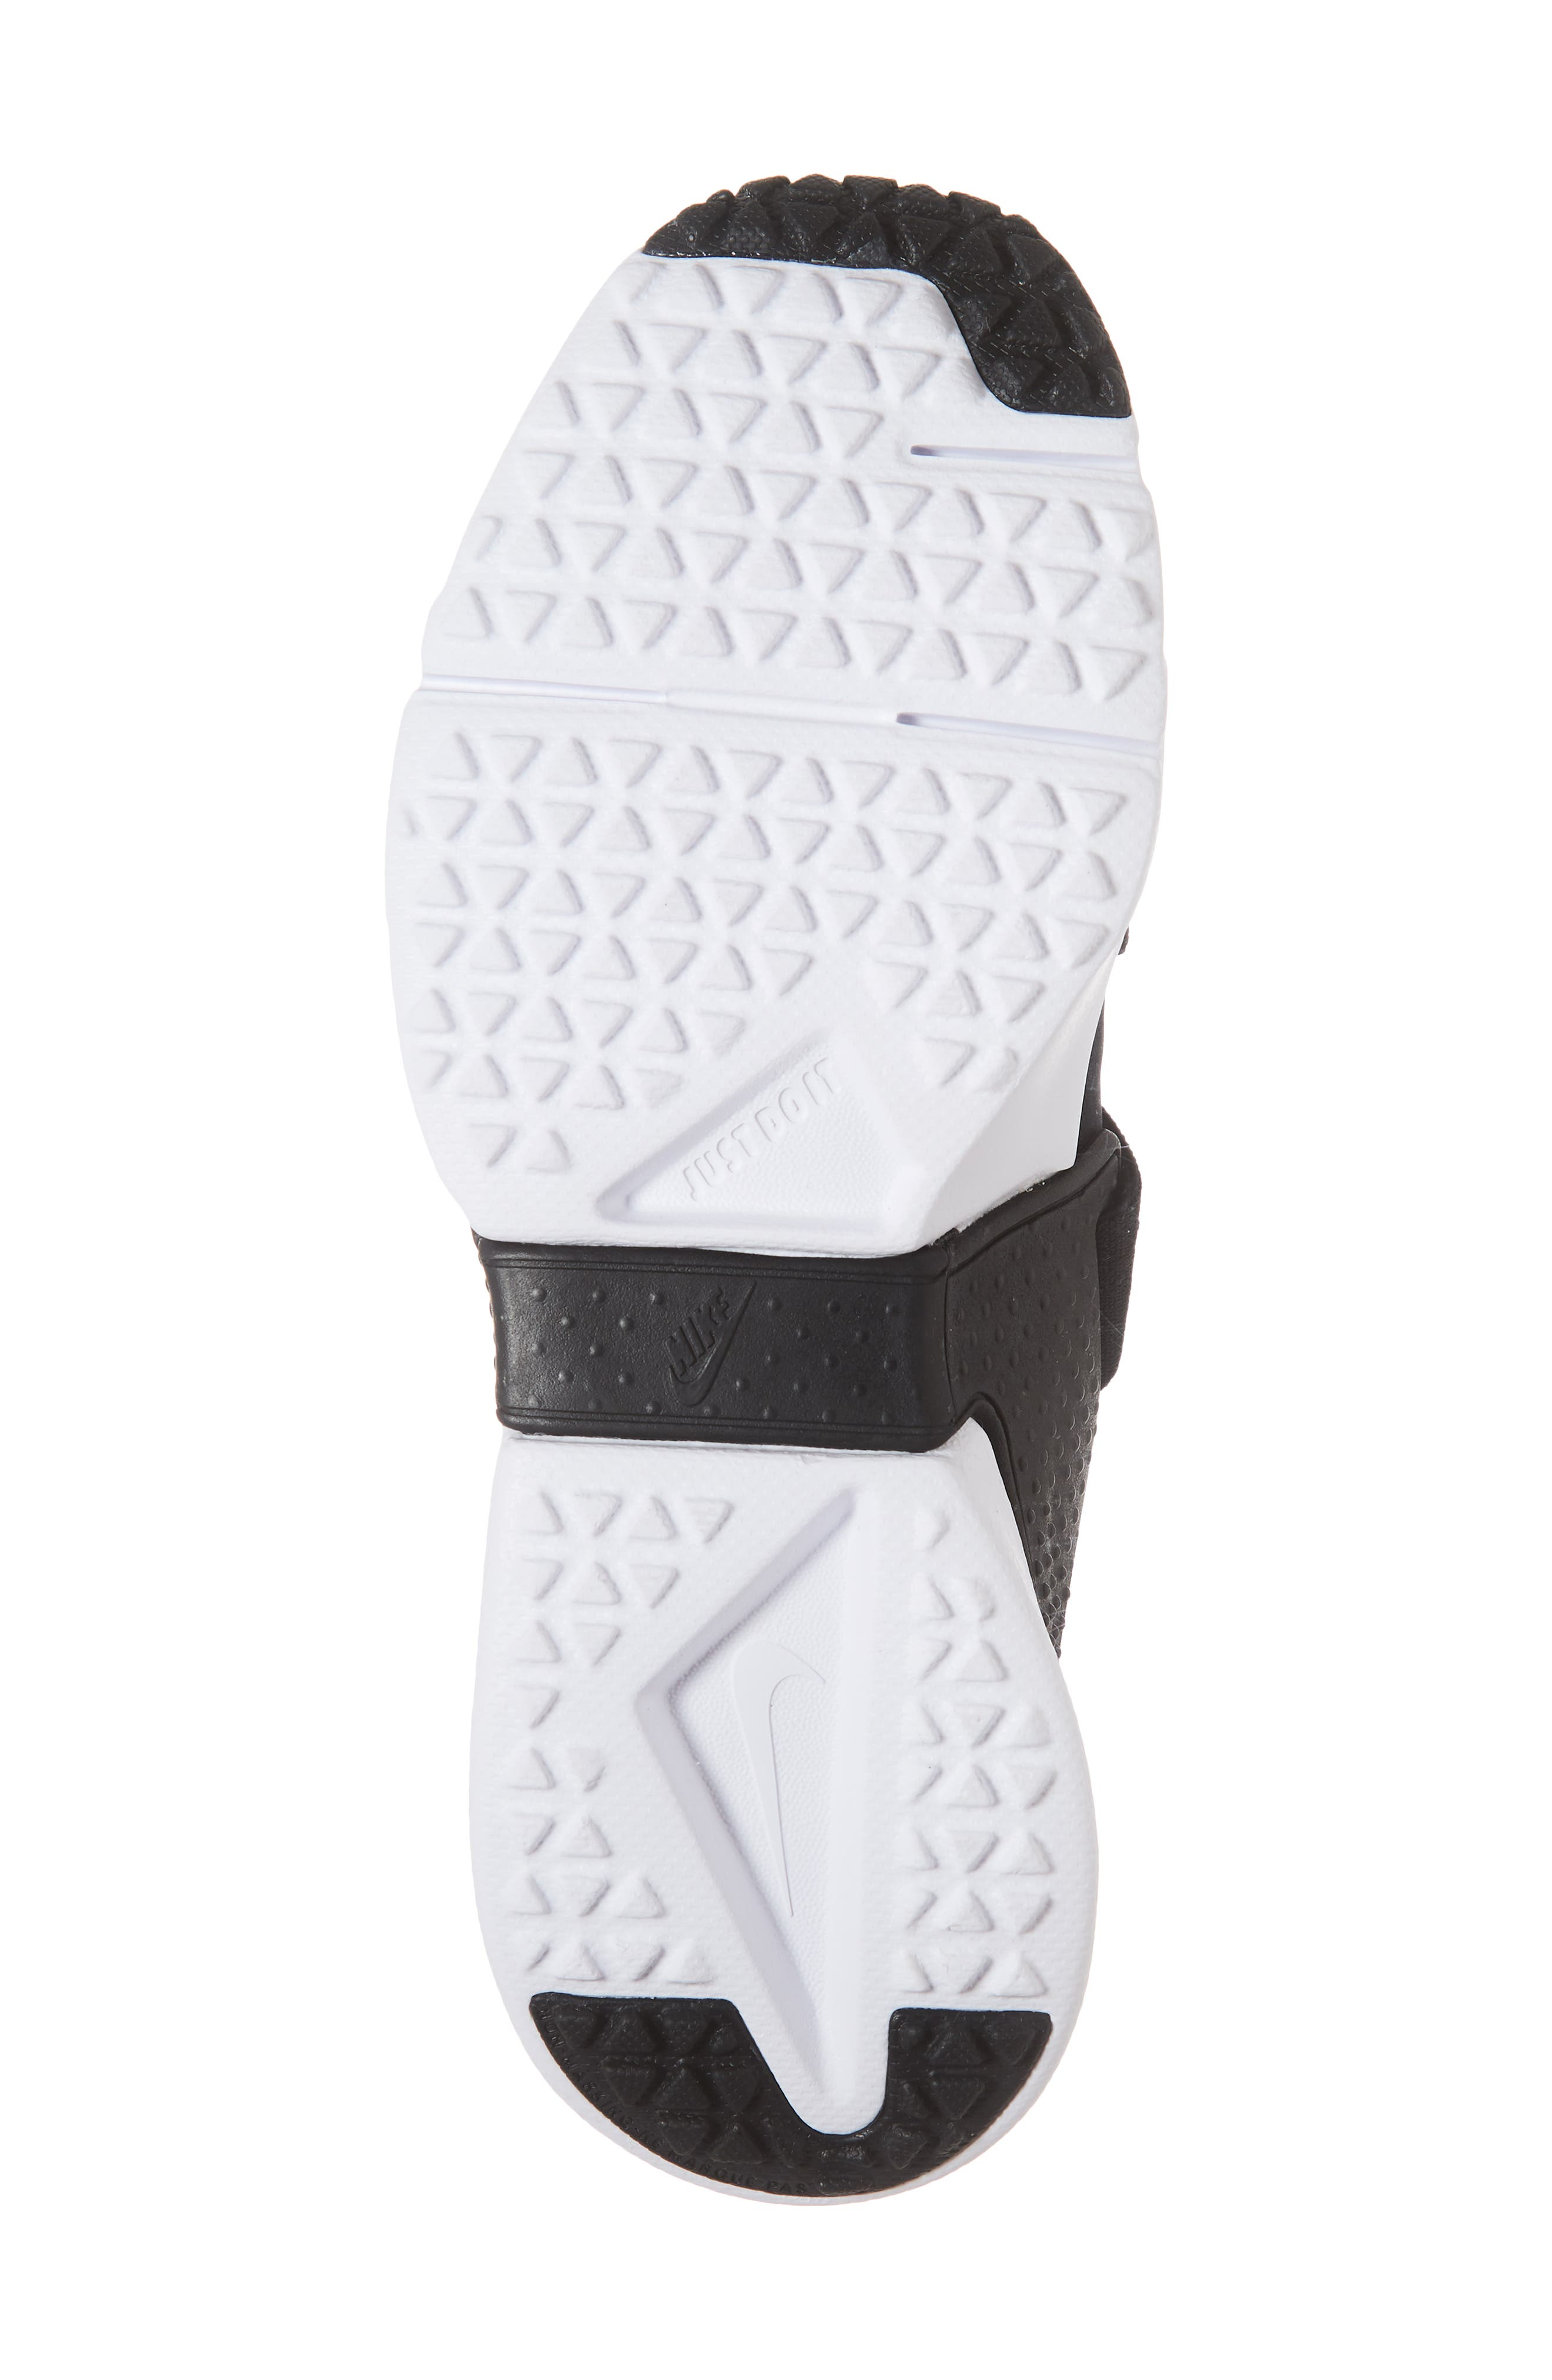 Huarache Extreme Sneaker,                             Alternate thumbnail 6, color,                             BLACK/ METALLIC GOLD/ WHITE